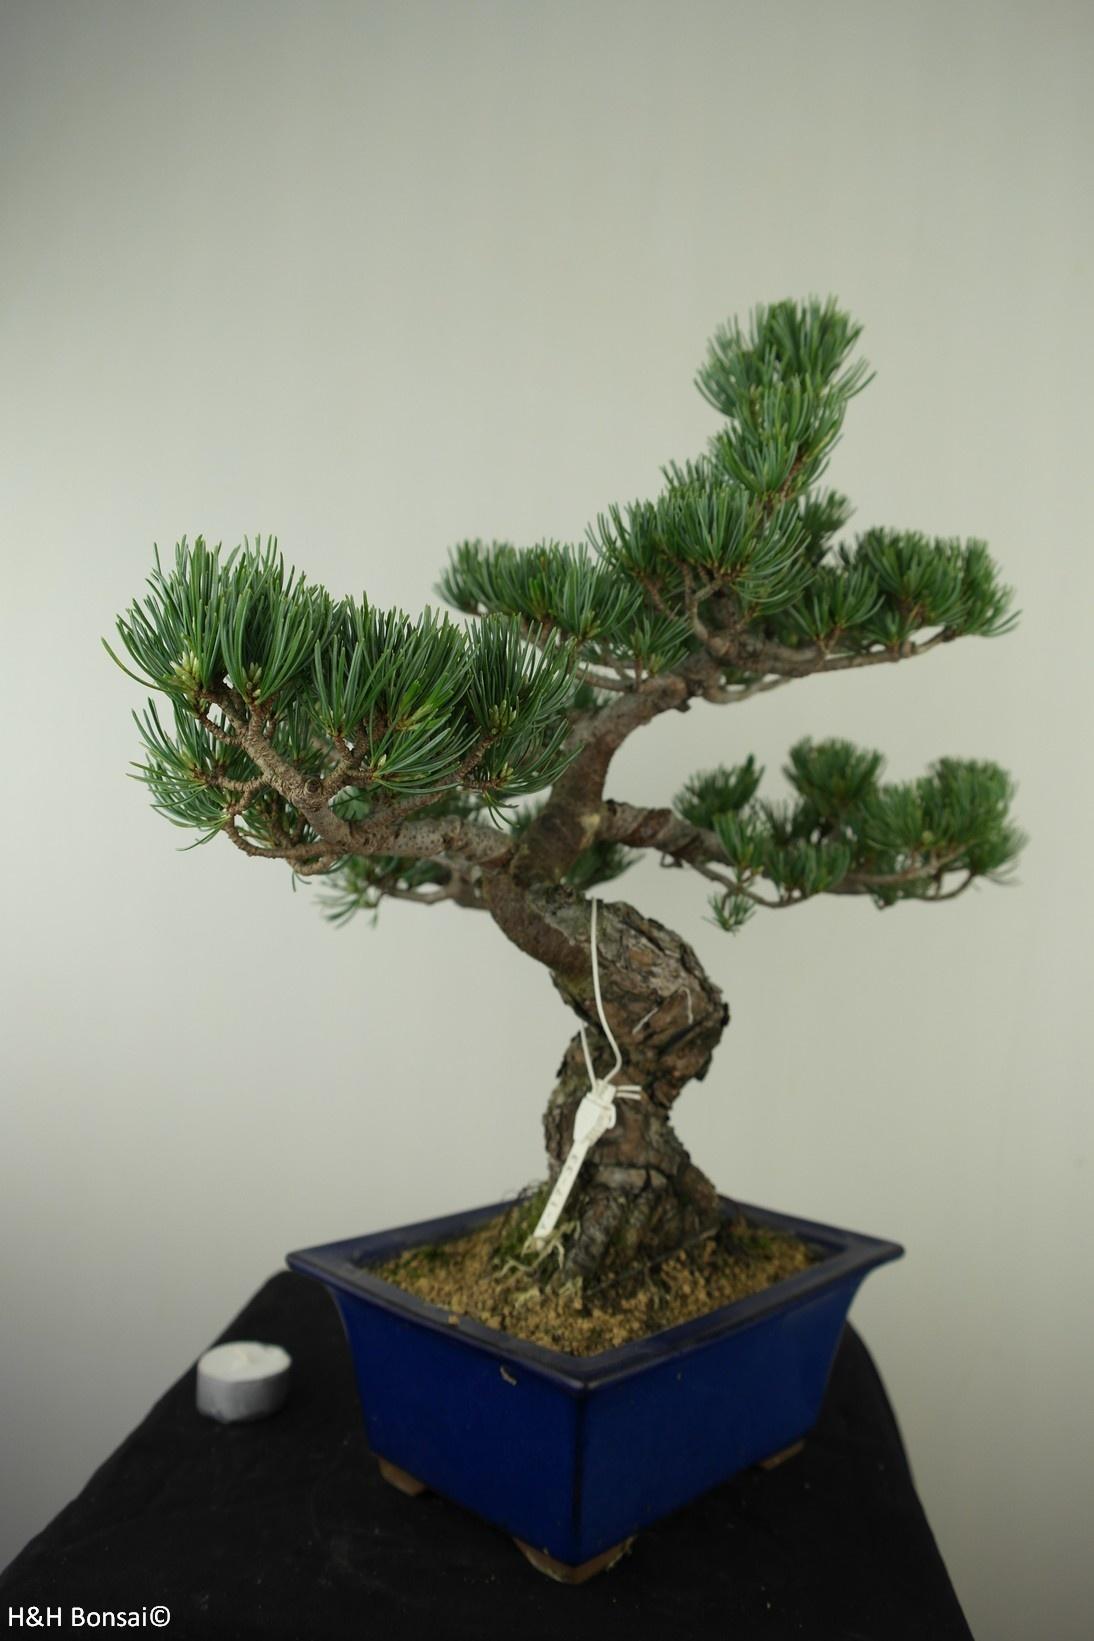 Bonsai Pinus pentaphylla, Japanse witte den, nr. 7803